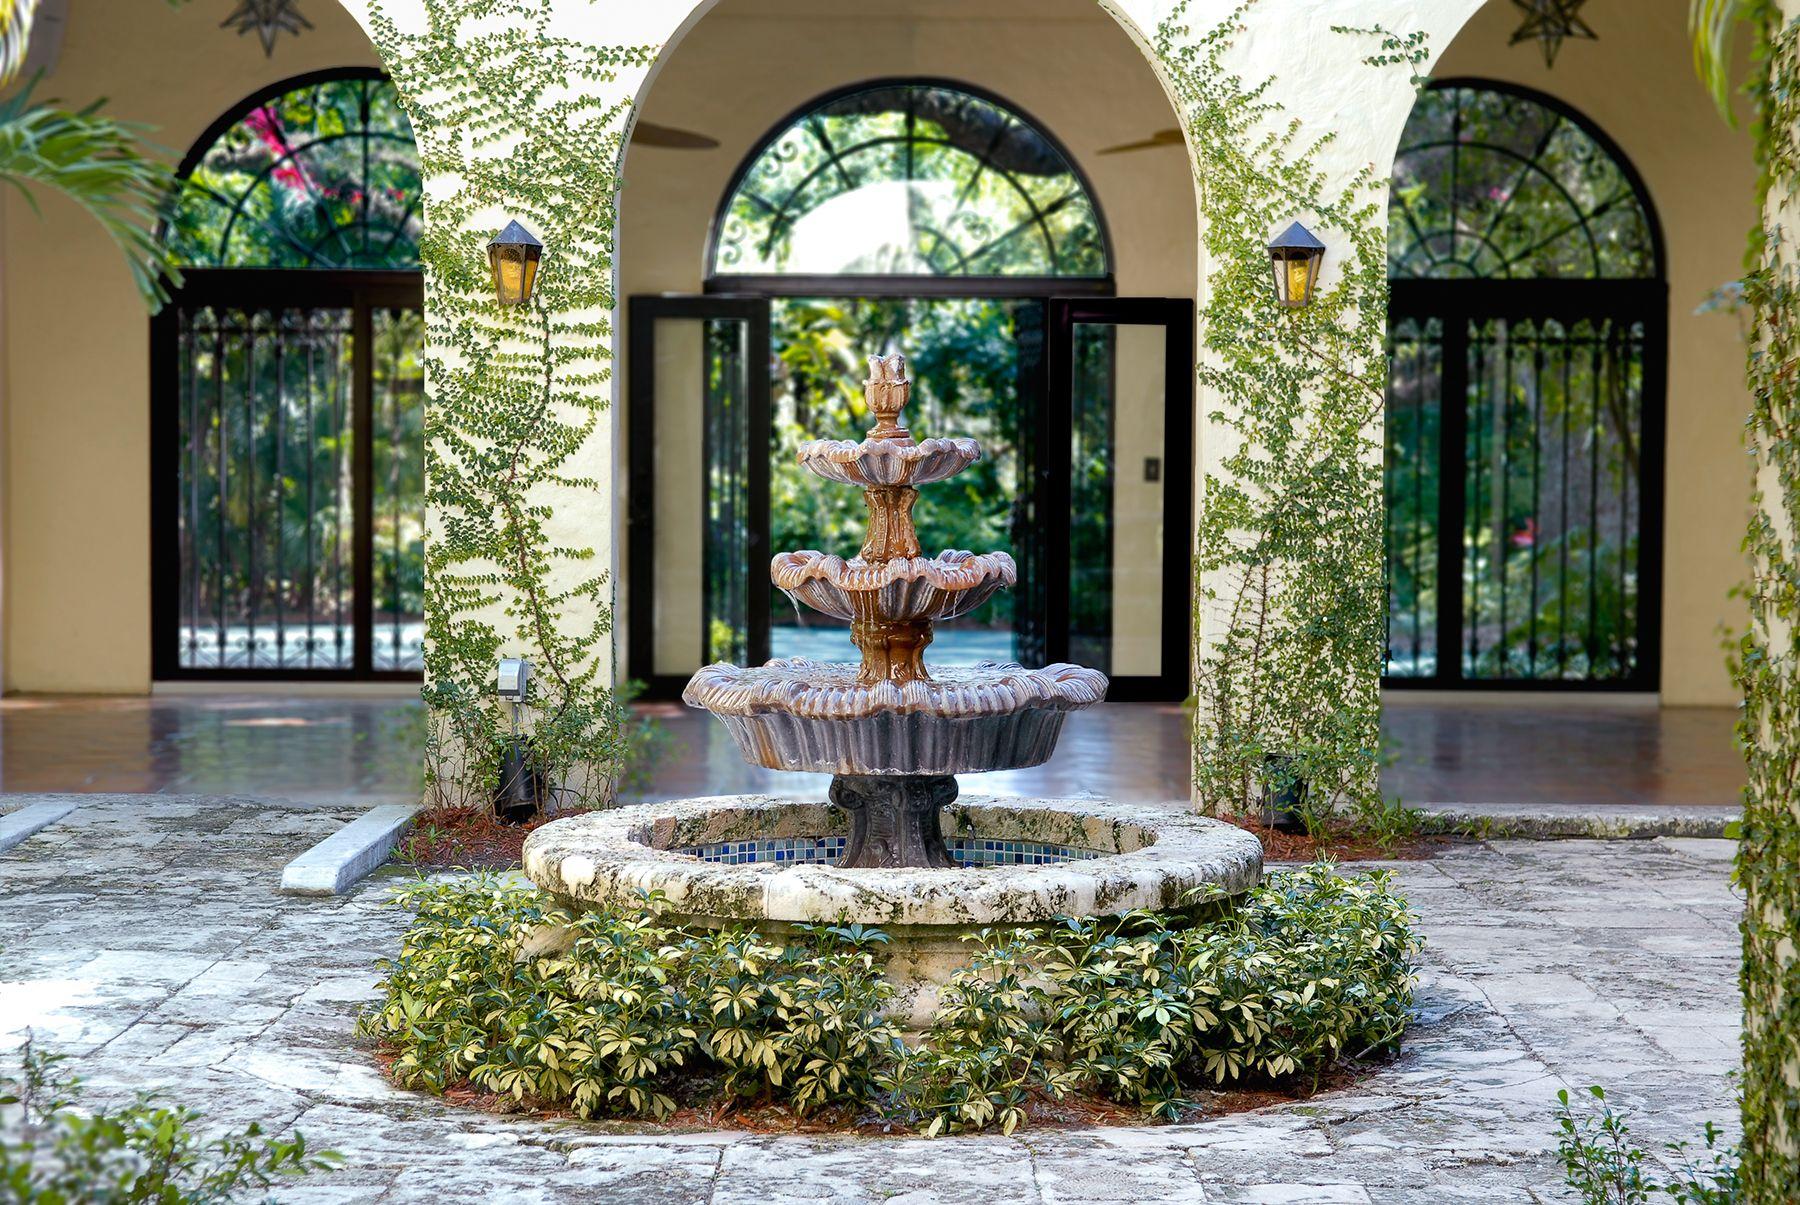 Courtyard Fountain Villa Woodbine. Architect Walter De